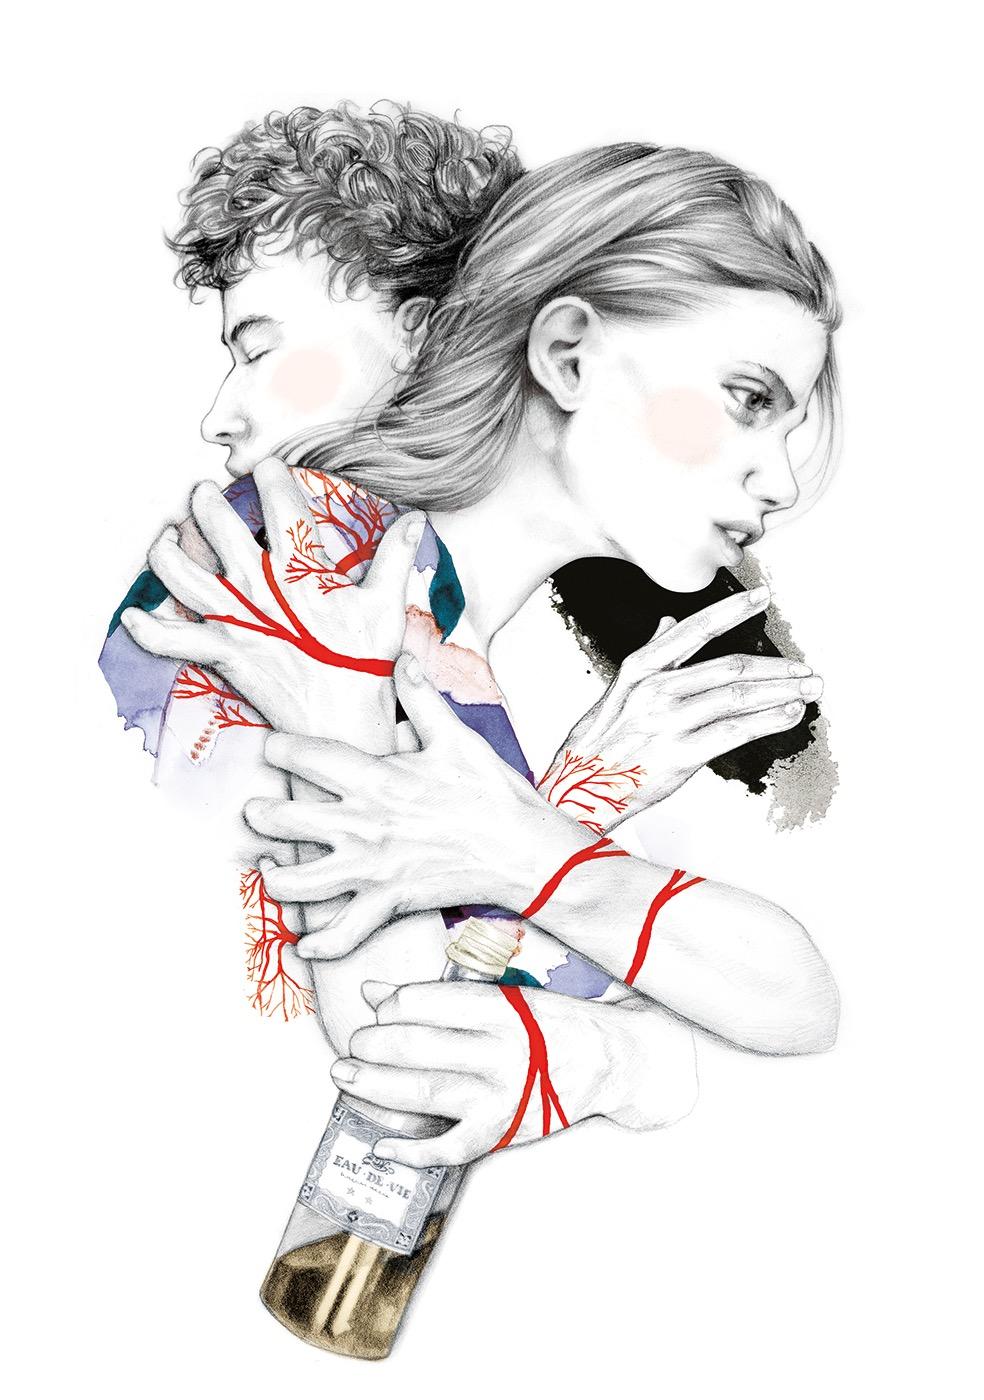 illustrator, illustrators, illustration, illustrations, woman, women, man, men, embrace, embracing, hug, hugging, alcohol, drink, bottle, branch, branches, plant, plants